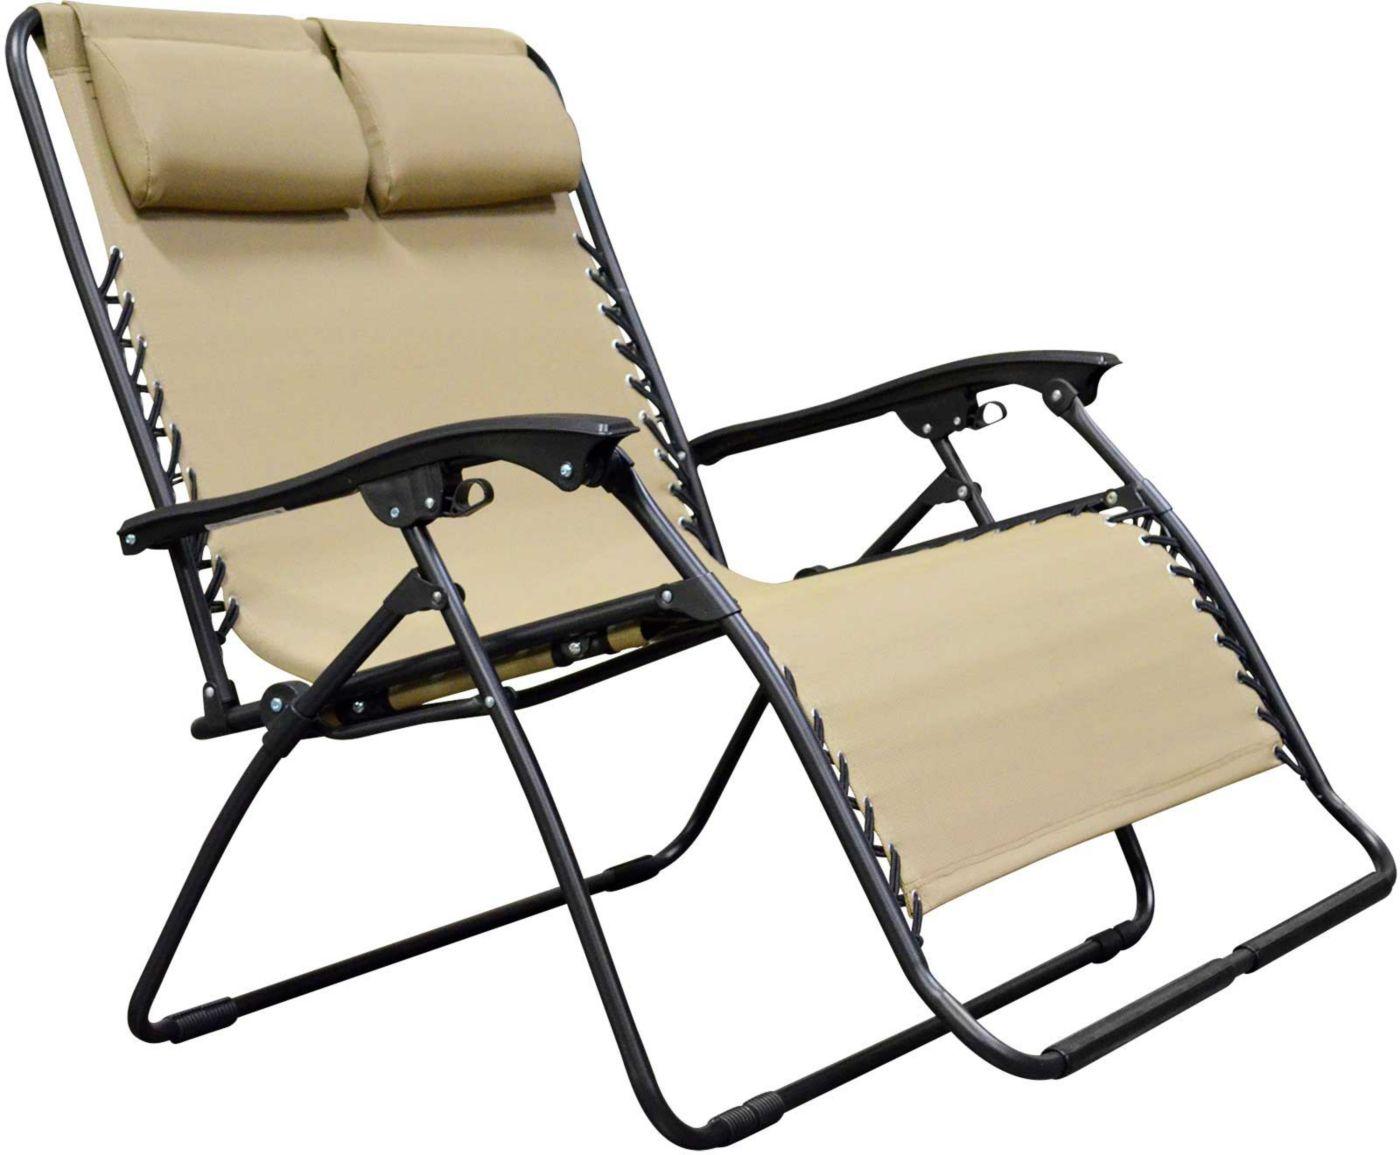 Caravan Sports Infinity Zero Gravity Loveseat Chair